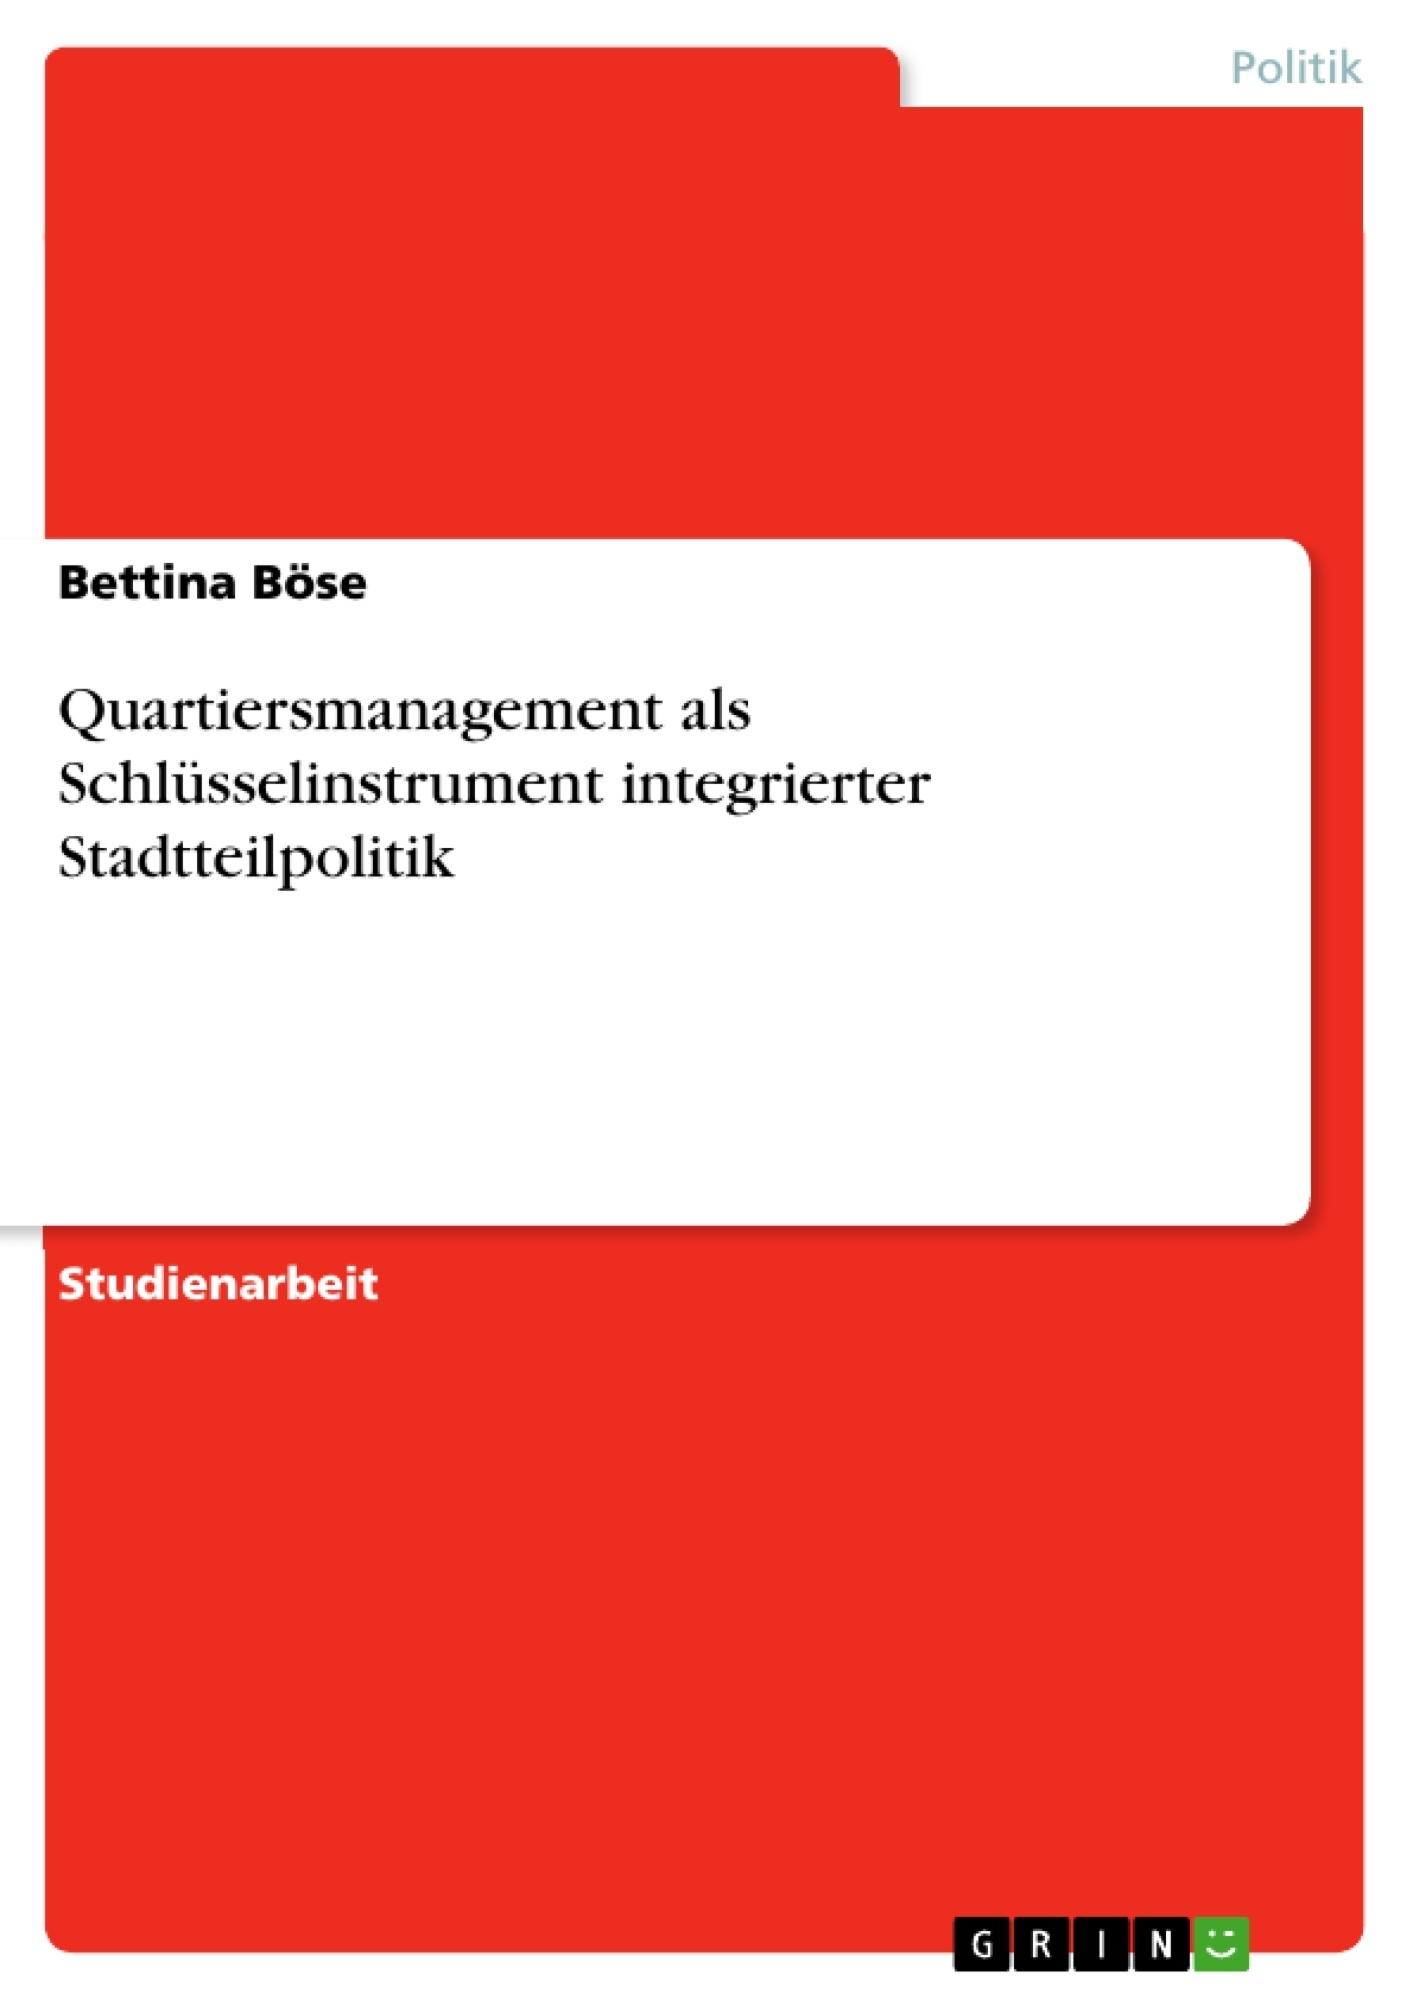 Titel: Quartiersmanagement als Schlüsselinstrument integrierter Stadtteilpolitik